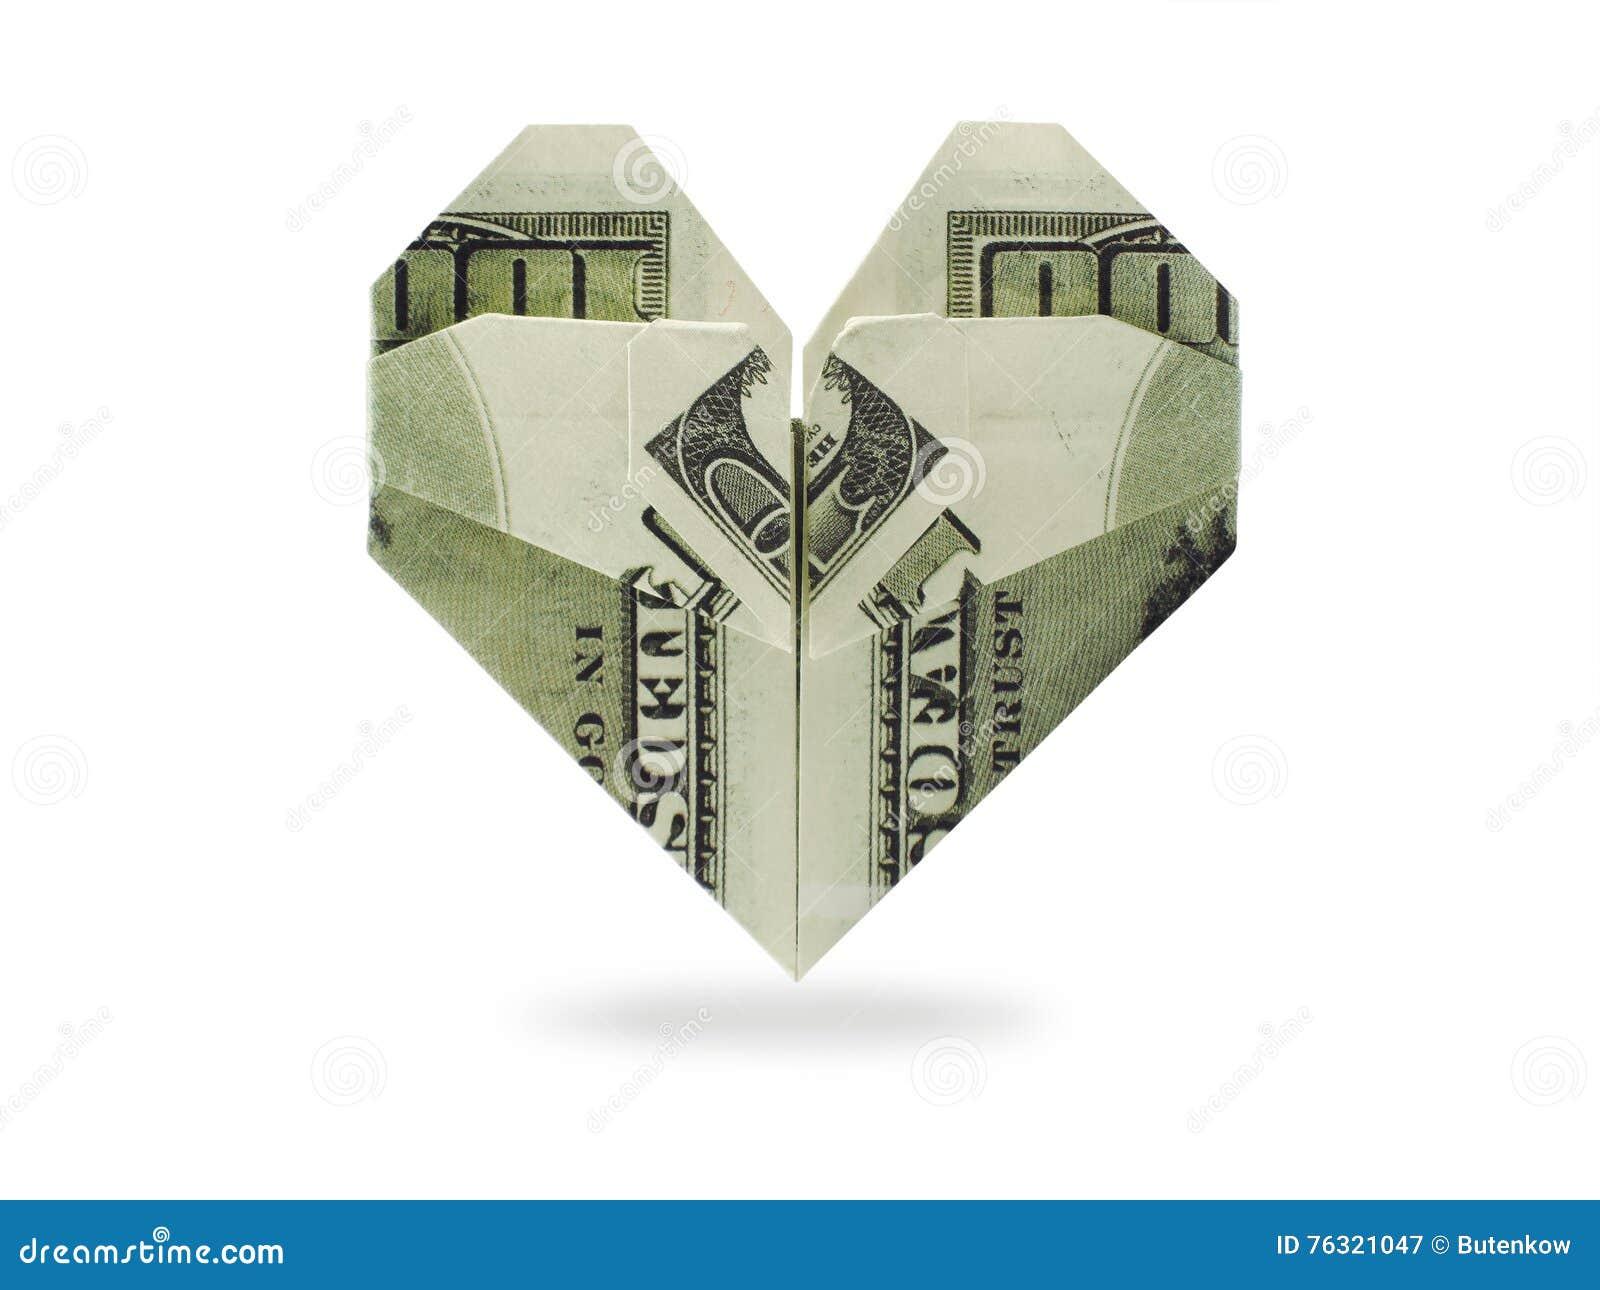 Superb Origami Heart Of Dollars Banknotes Stock Image Image Of Diagram Wiring 101 Photwellnesstrialsorg